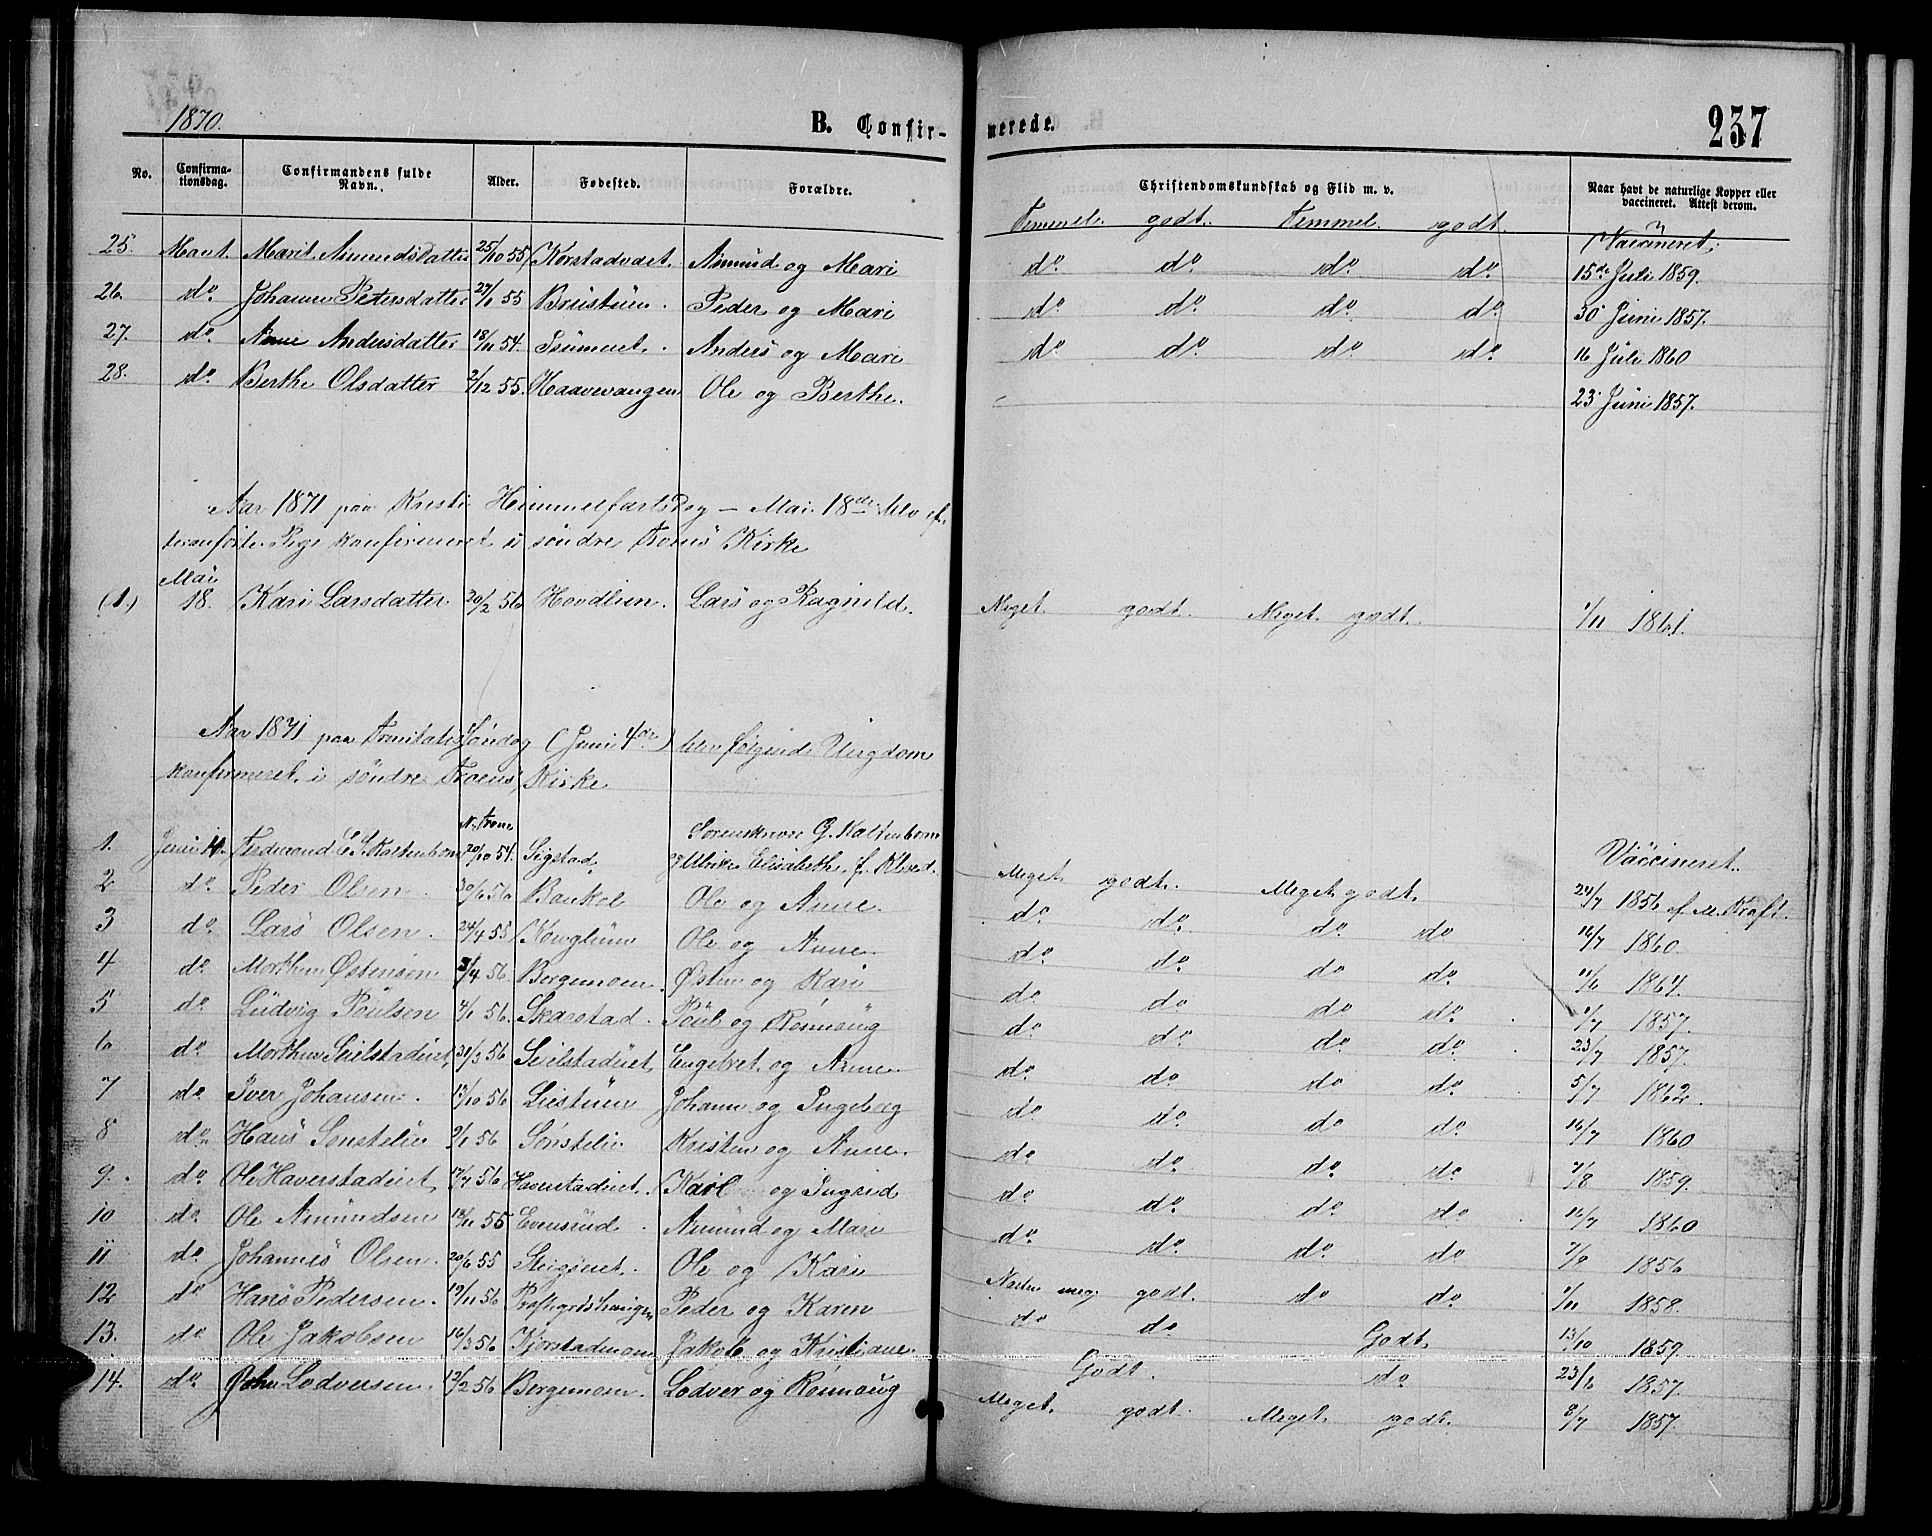 SAH, Sør-Fron prestekontor, H/Ha/Hab/L0002: Klokkerbok nr. 2, 1864-1883, s. 237